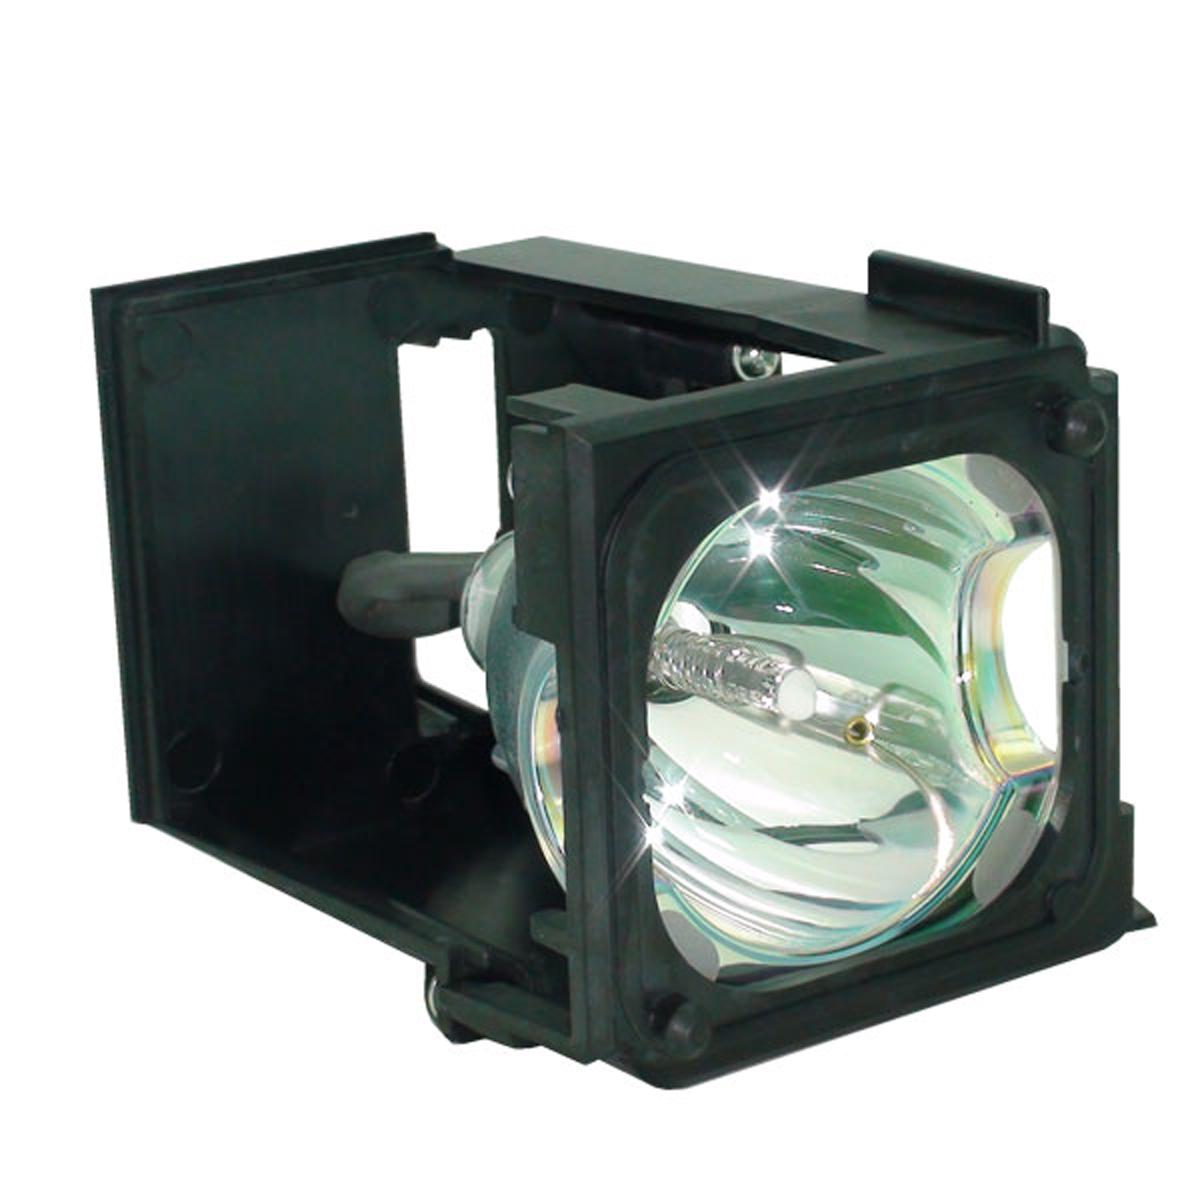 about lamp housing for samsung hlt5076sxxaa projection tv bulb dlp. Black Bedroom Furniture Sets. Home Design Ideas